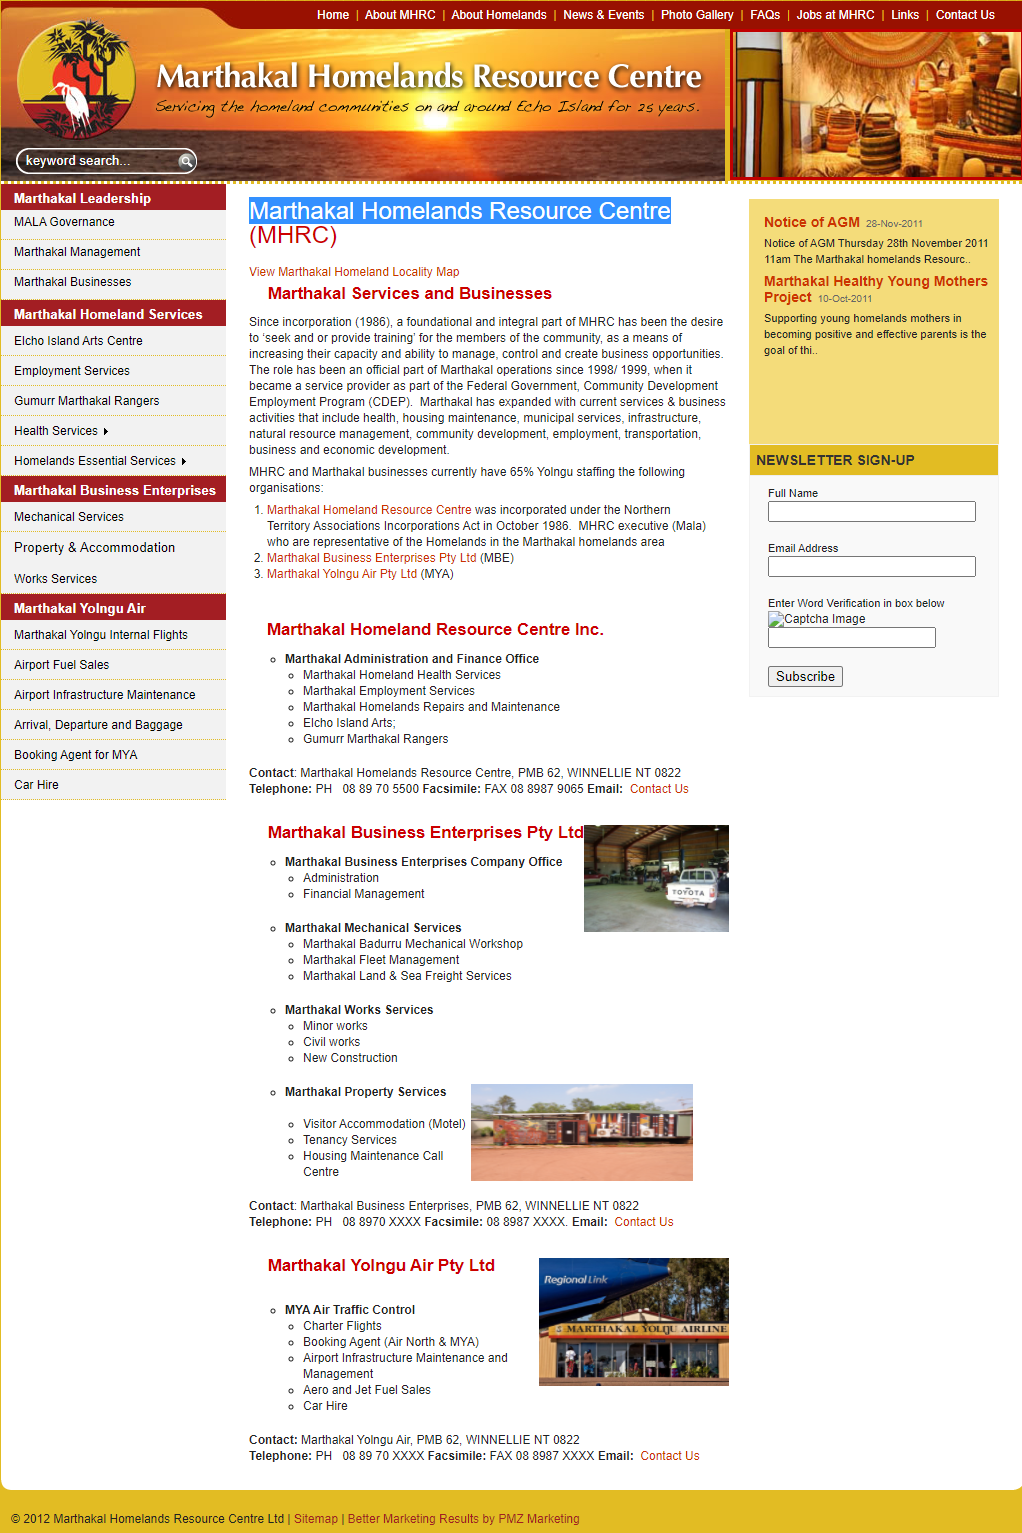 Marthakal Homelands Resource Centre